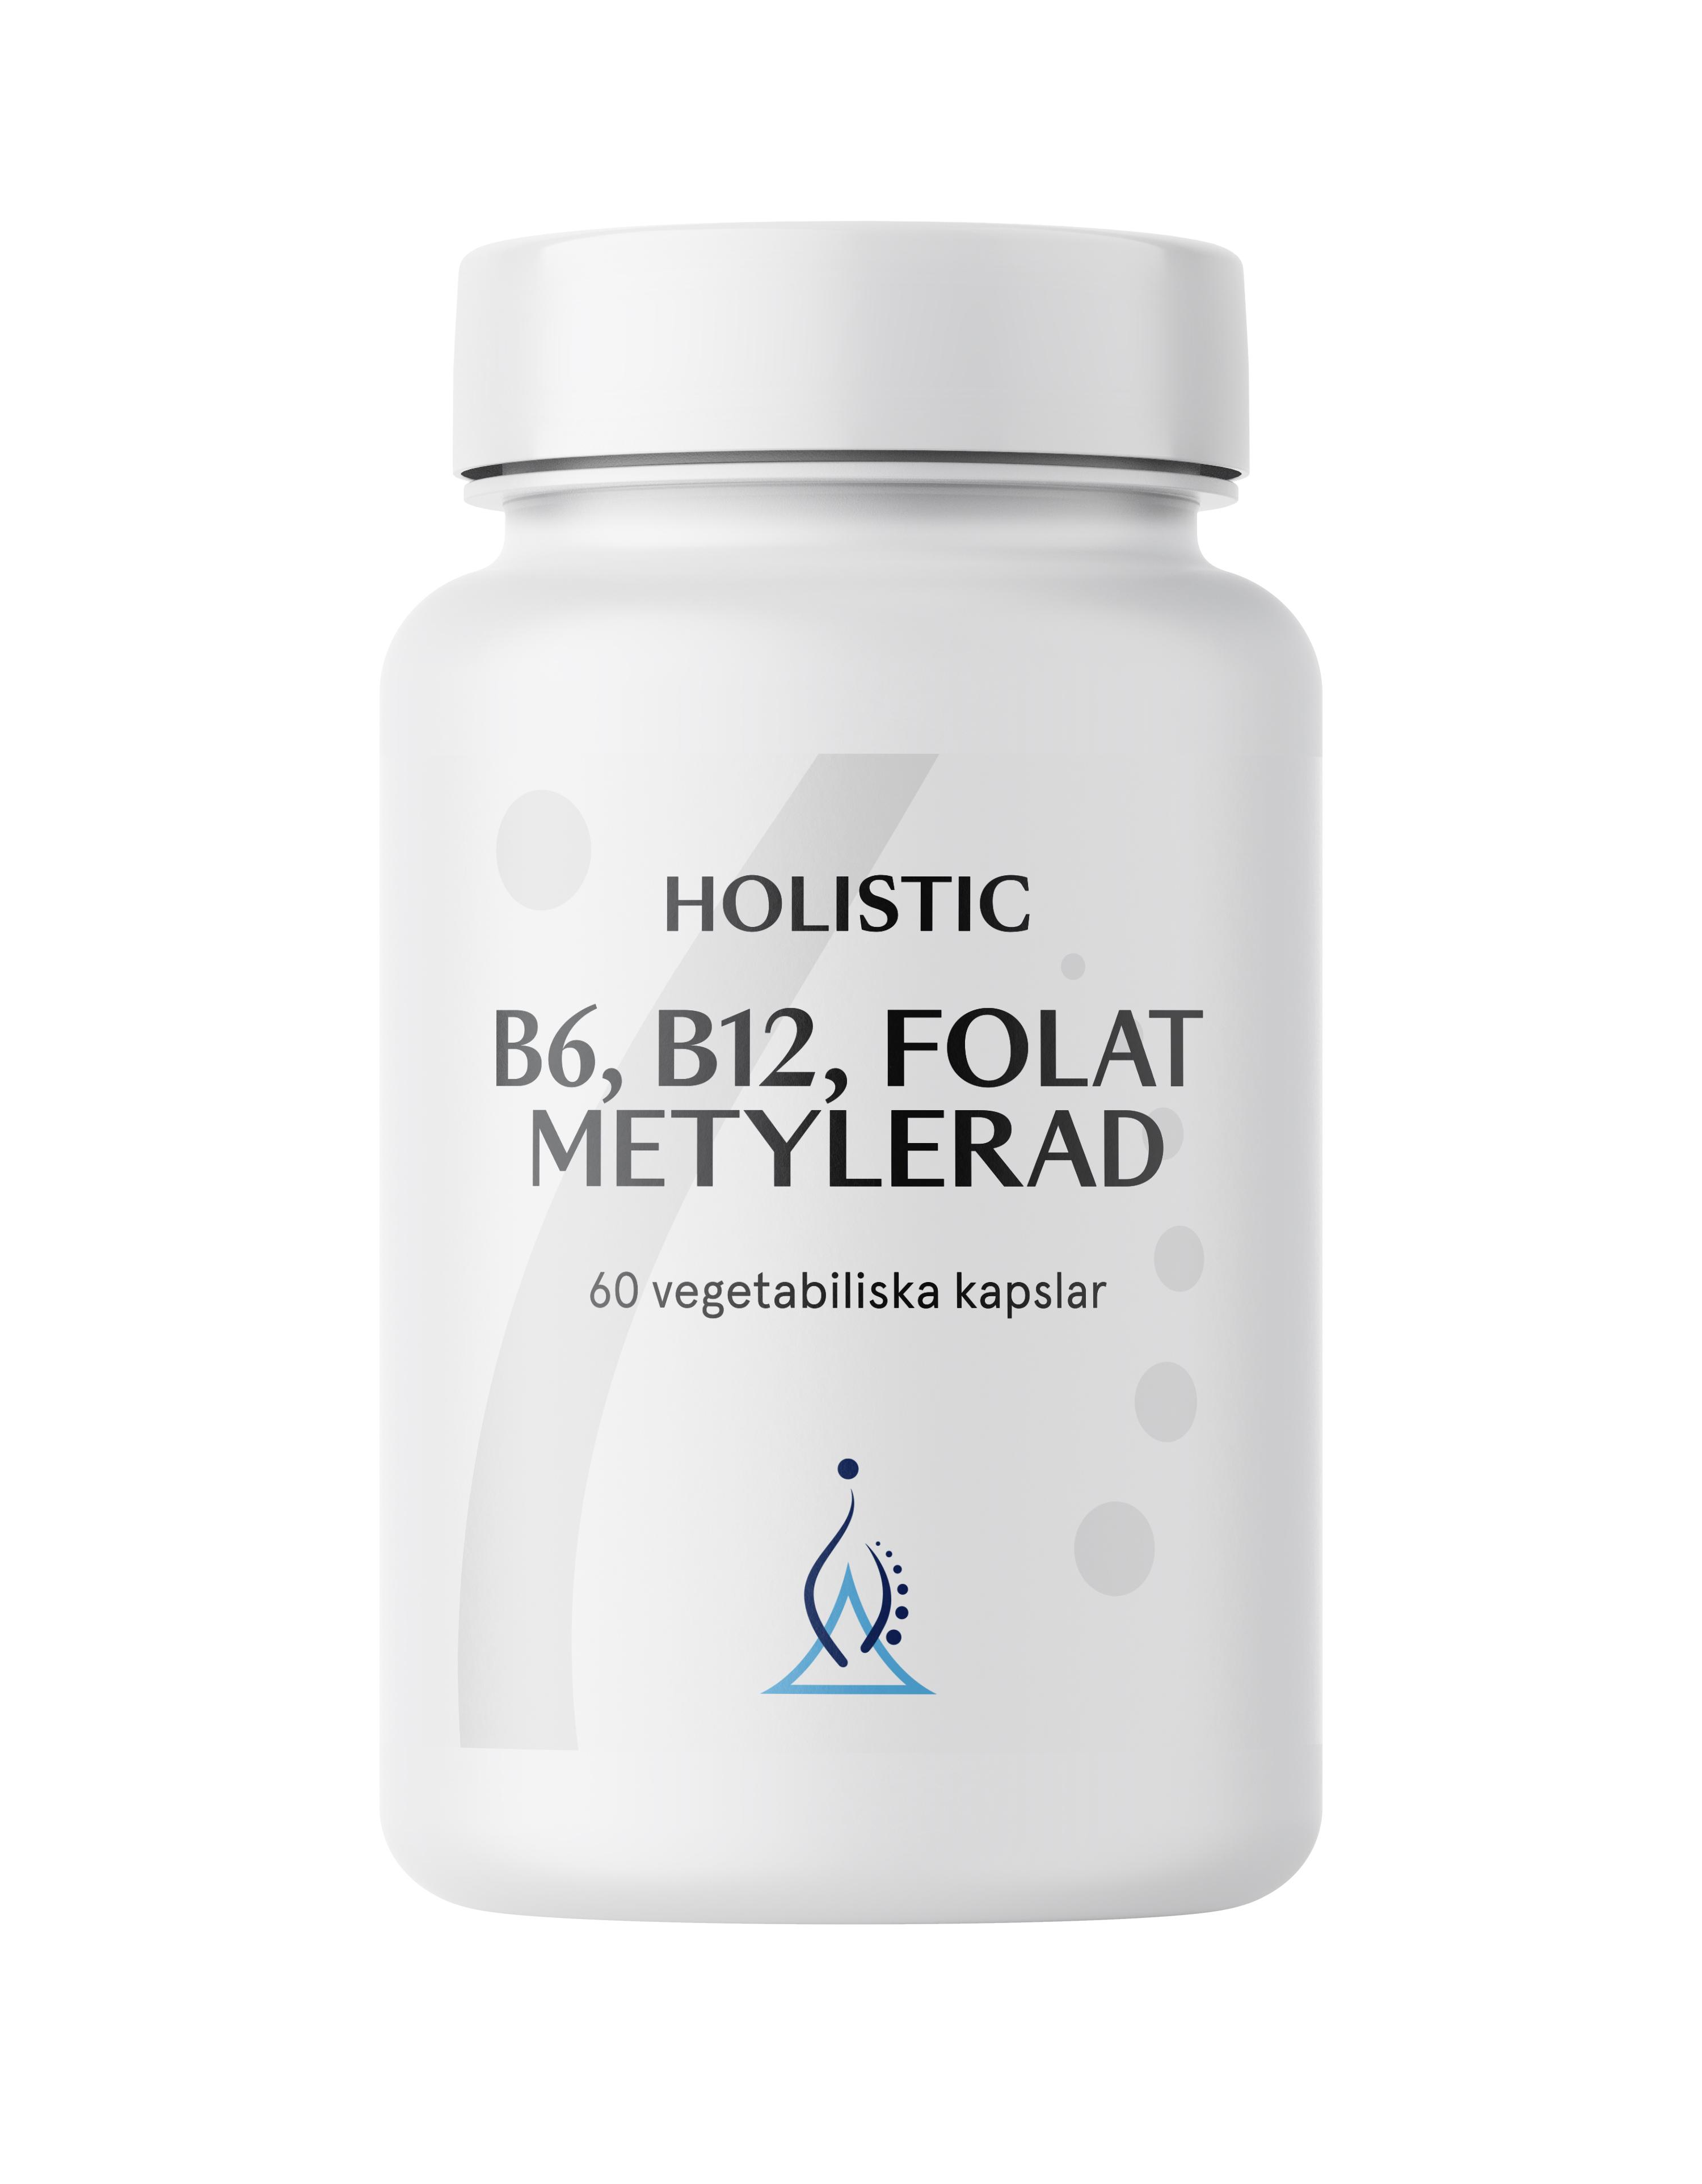 Holistic B6, B12, Folat Metylerad (metylowane B6, B12, kwas foliowy)